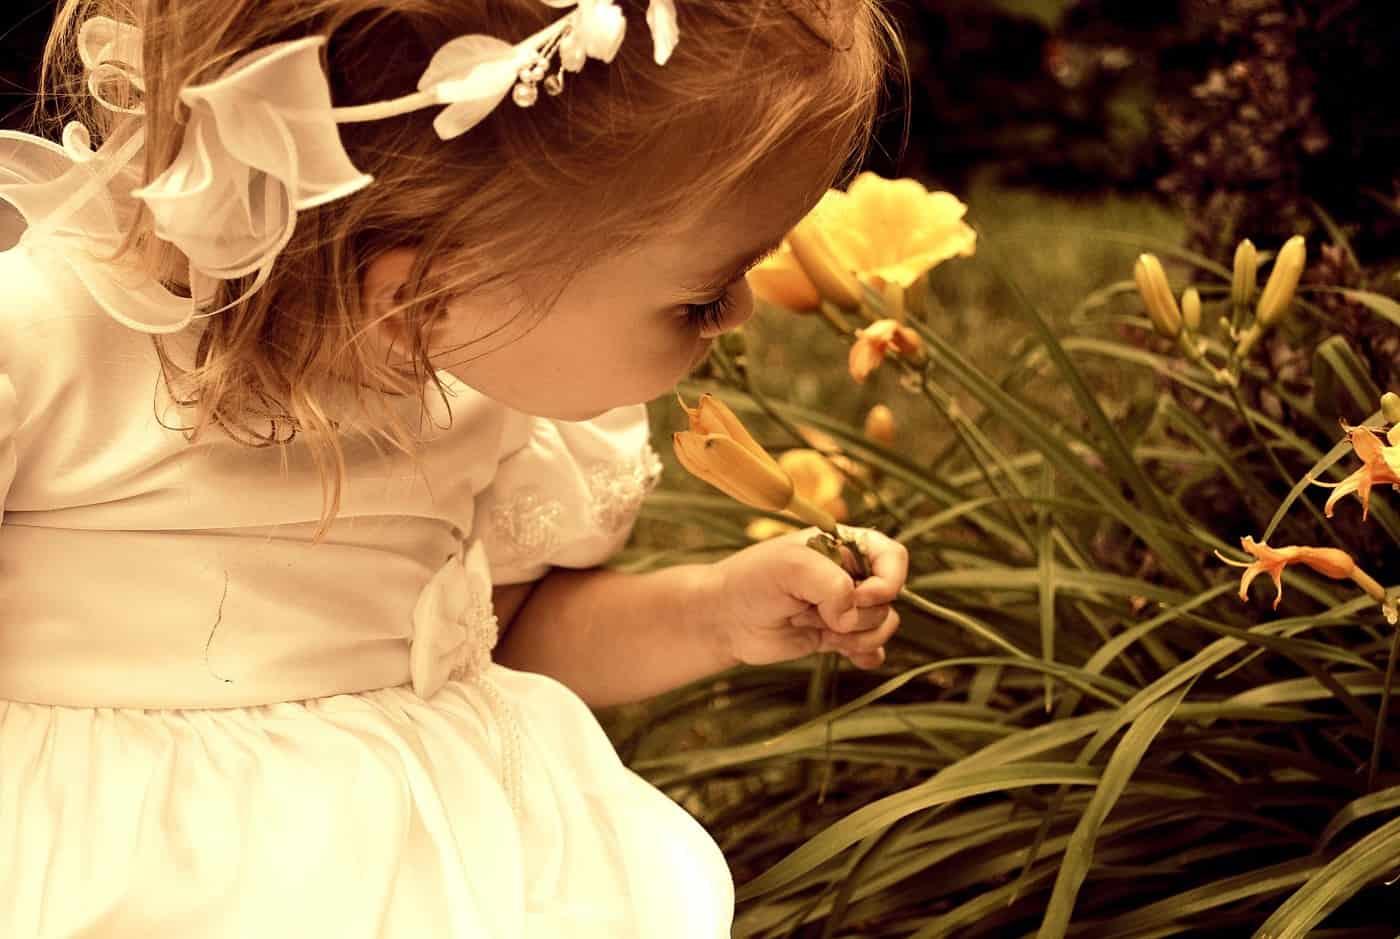 Little girl in fancy dress smelling flower - The law of observation